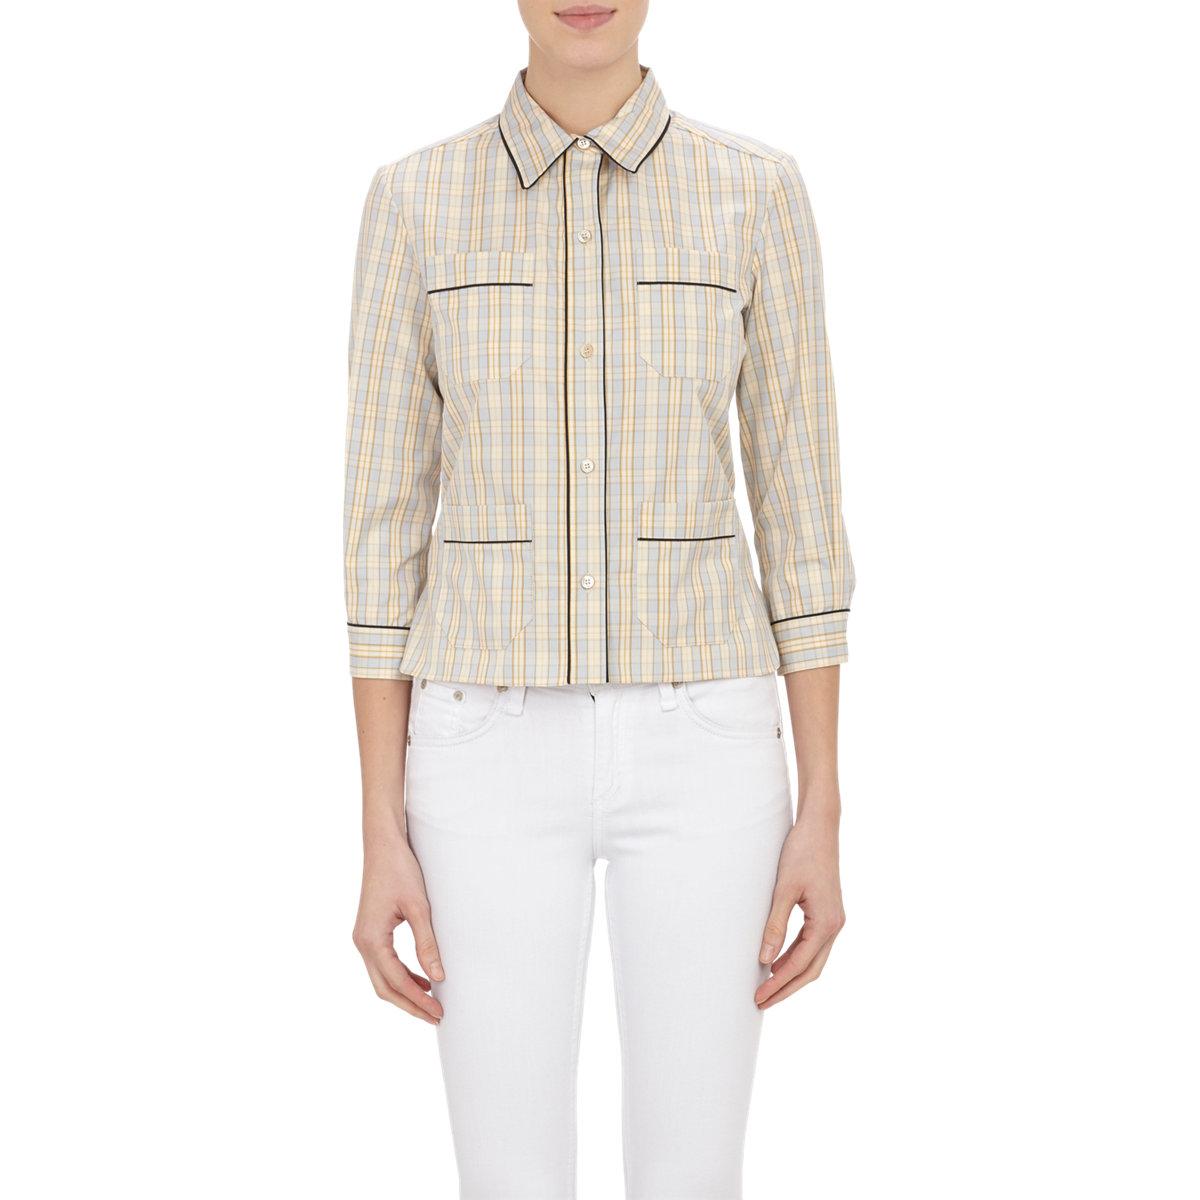 Marni women 39 s plaid shirt in gray lyst for Grey plaid shirt womens